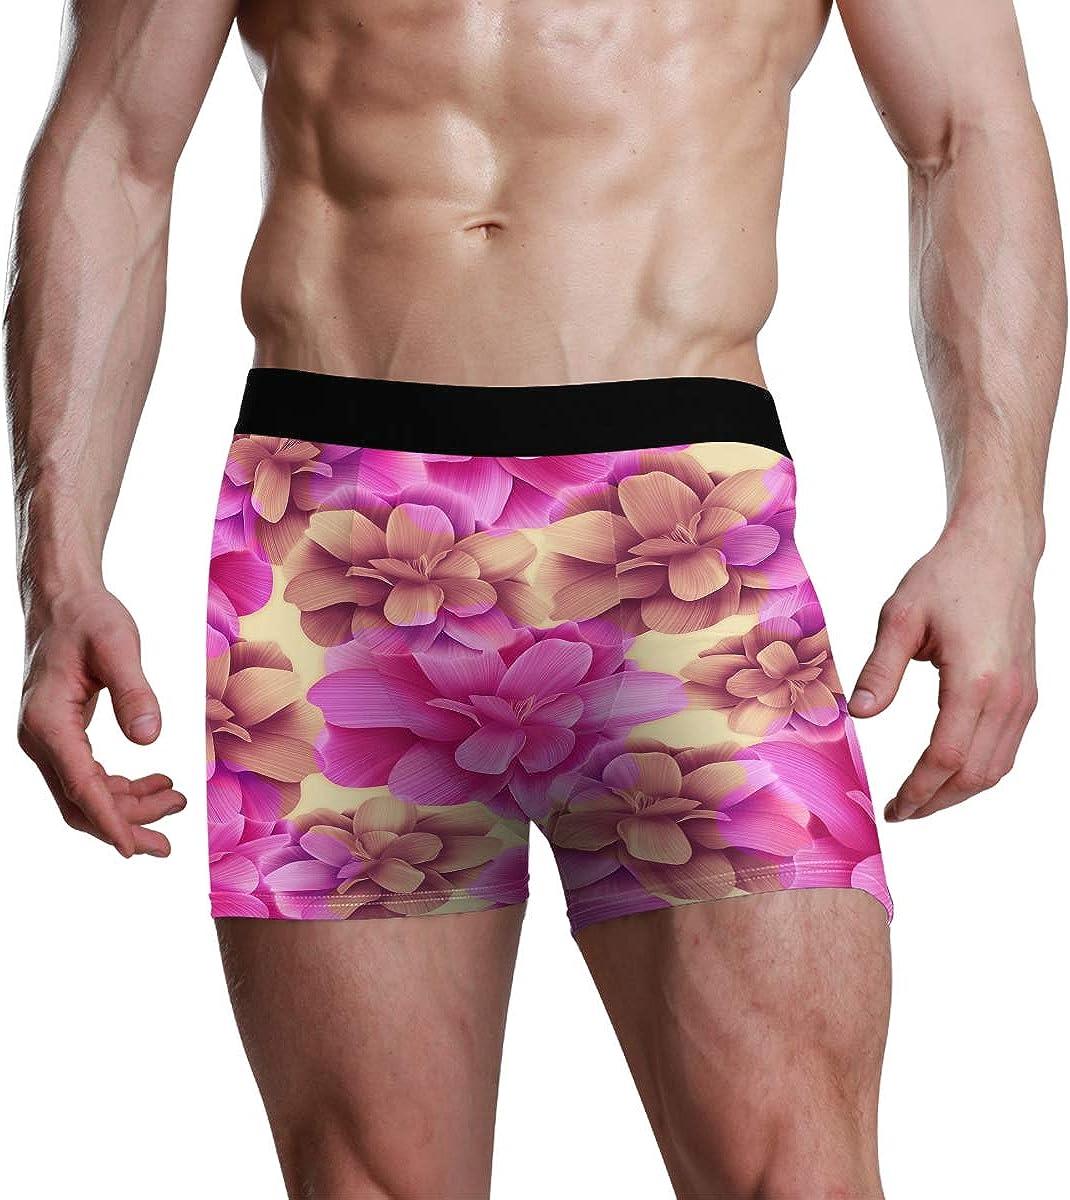 Mens Boxer Briefs Seamless Tropical Flower Plant and Leaf Pattern Backgroun Low Rise Trunks Underwear Breathable Bikini Boys